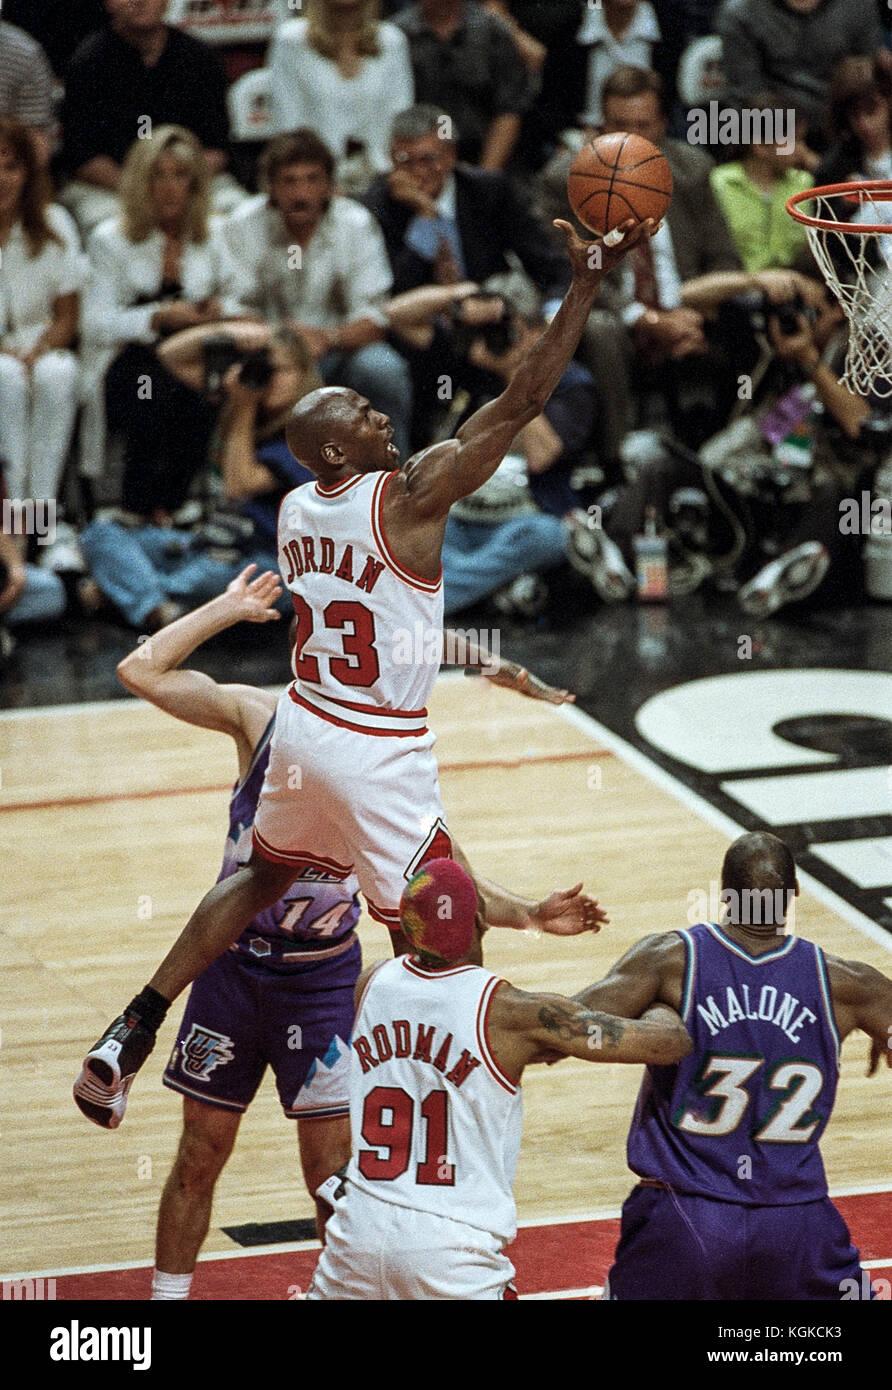 Michael Jordan Nba Stockfotos & Michael Jordan Nba Bilder - Alamy